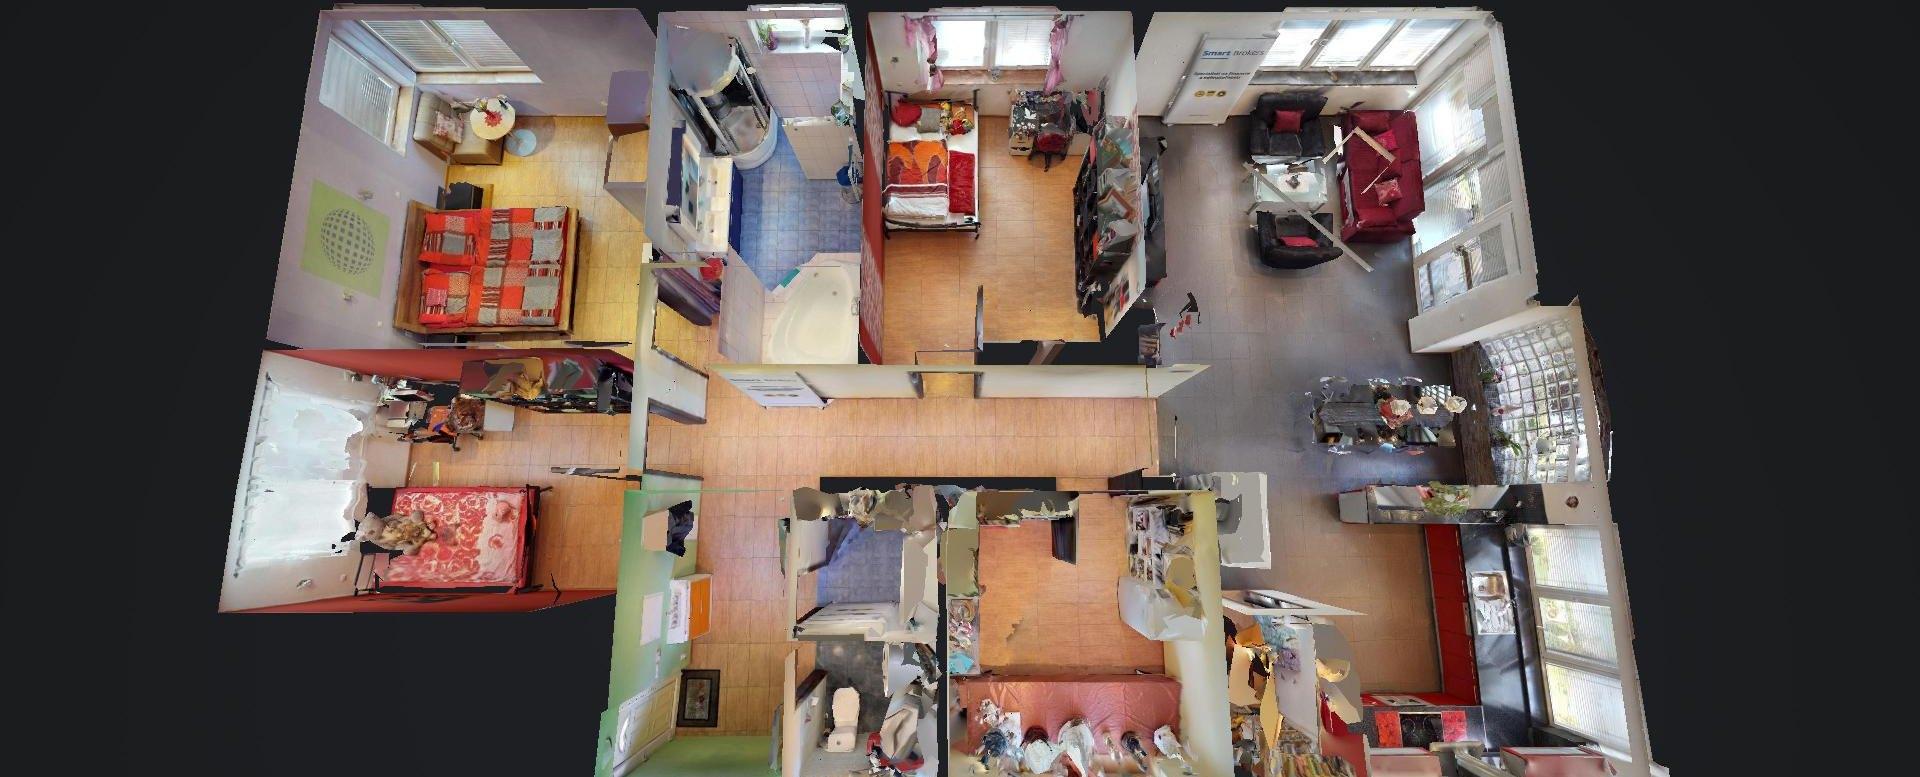 Obývacia izba s ku3D pôdorys 5-izbového rodinného domu v Čečínskej Potôni